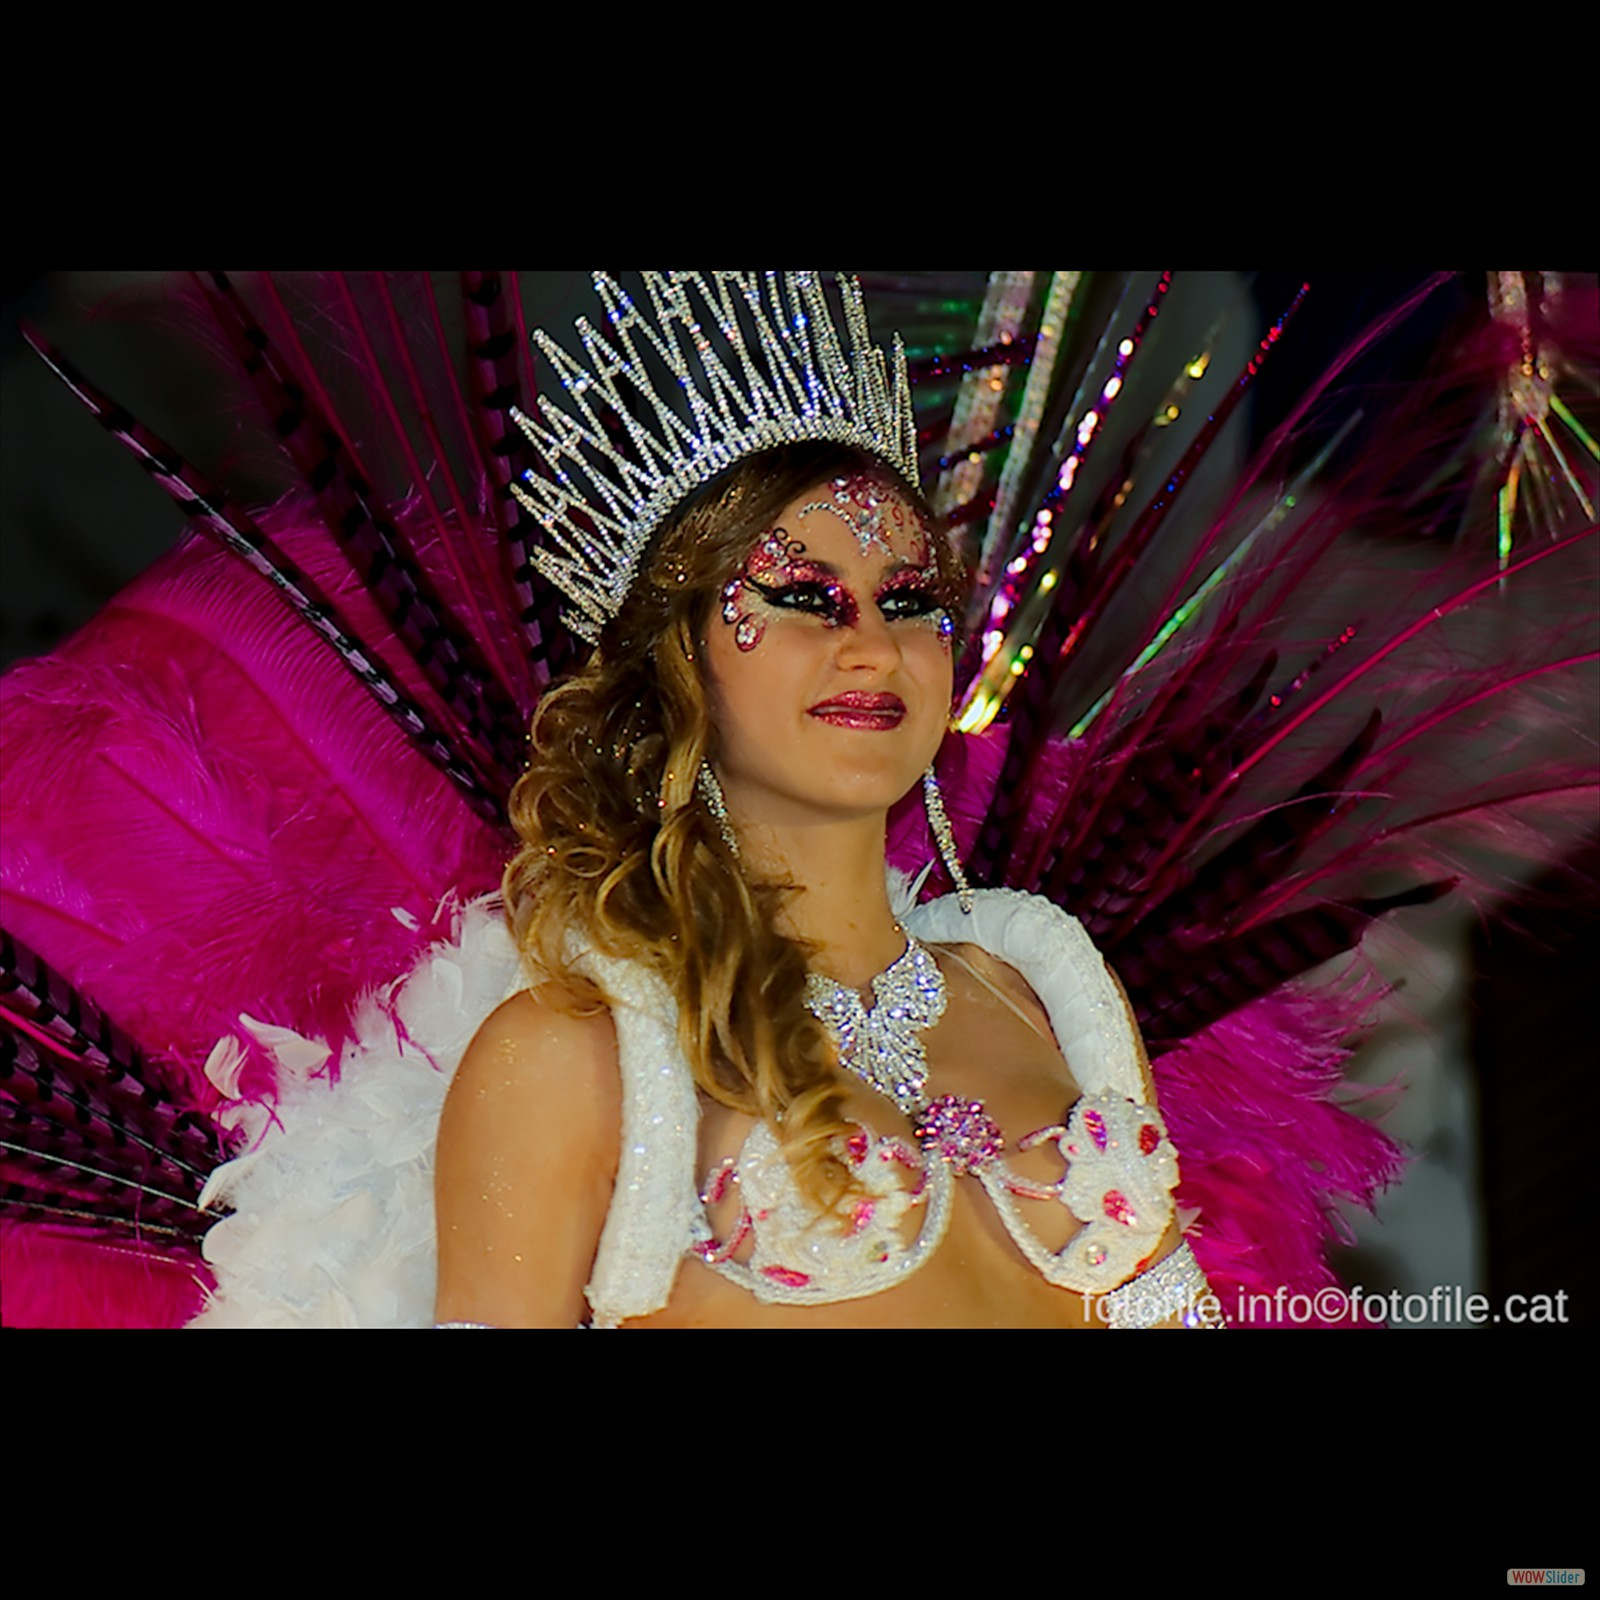 CarnavalSitges2013_05605_v2